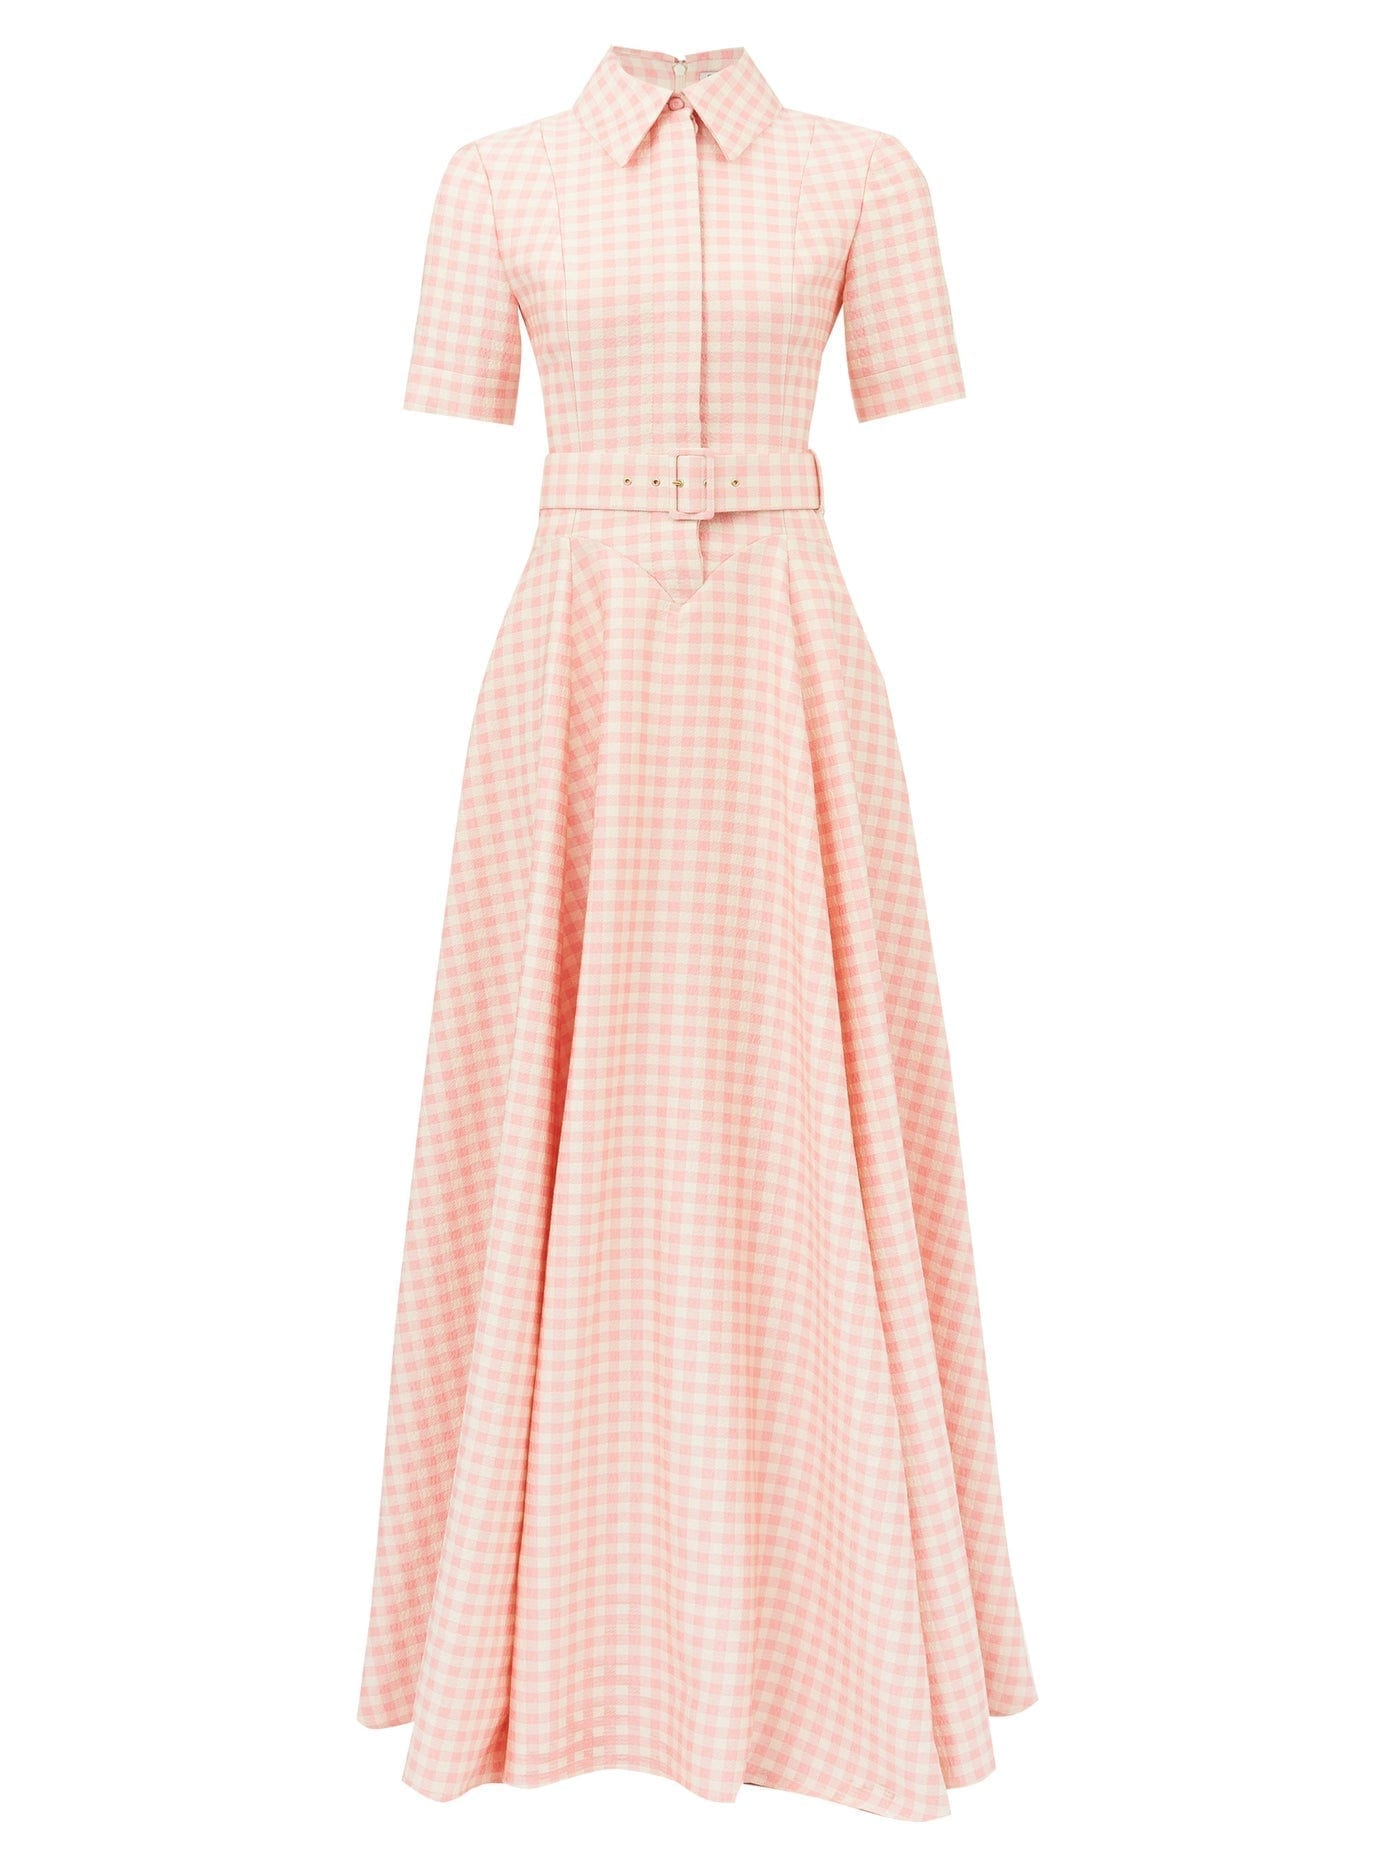 EMILIA WICKSTEAD Josie Belted Gingham Shirt Dress